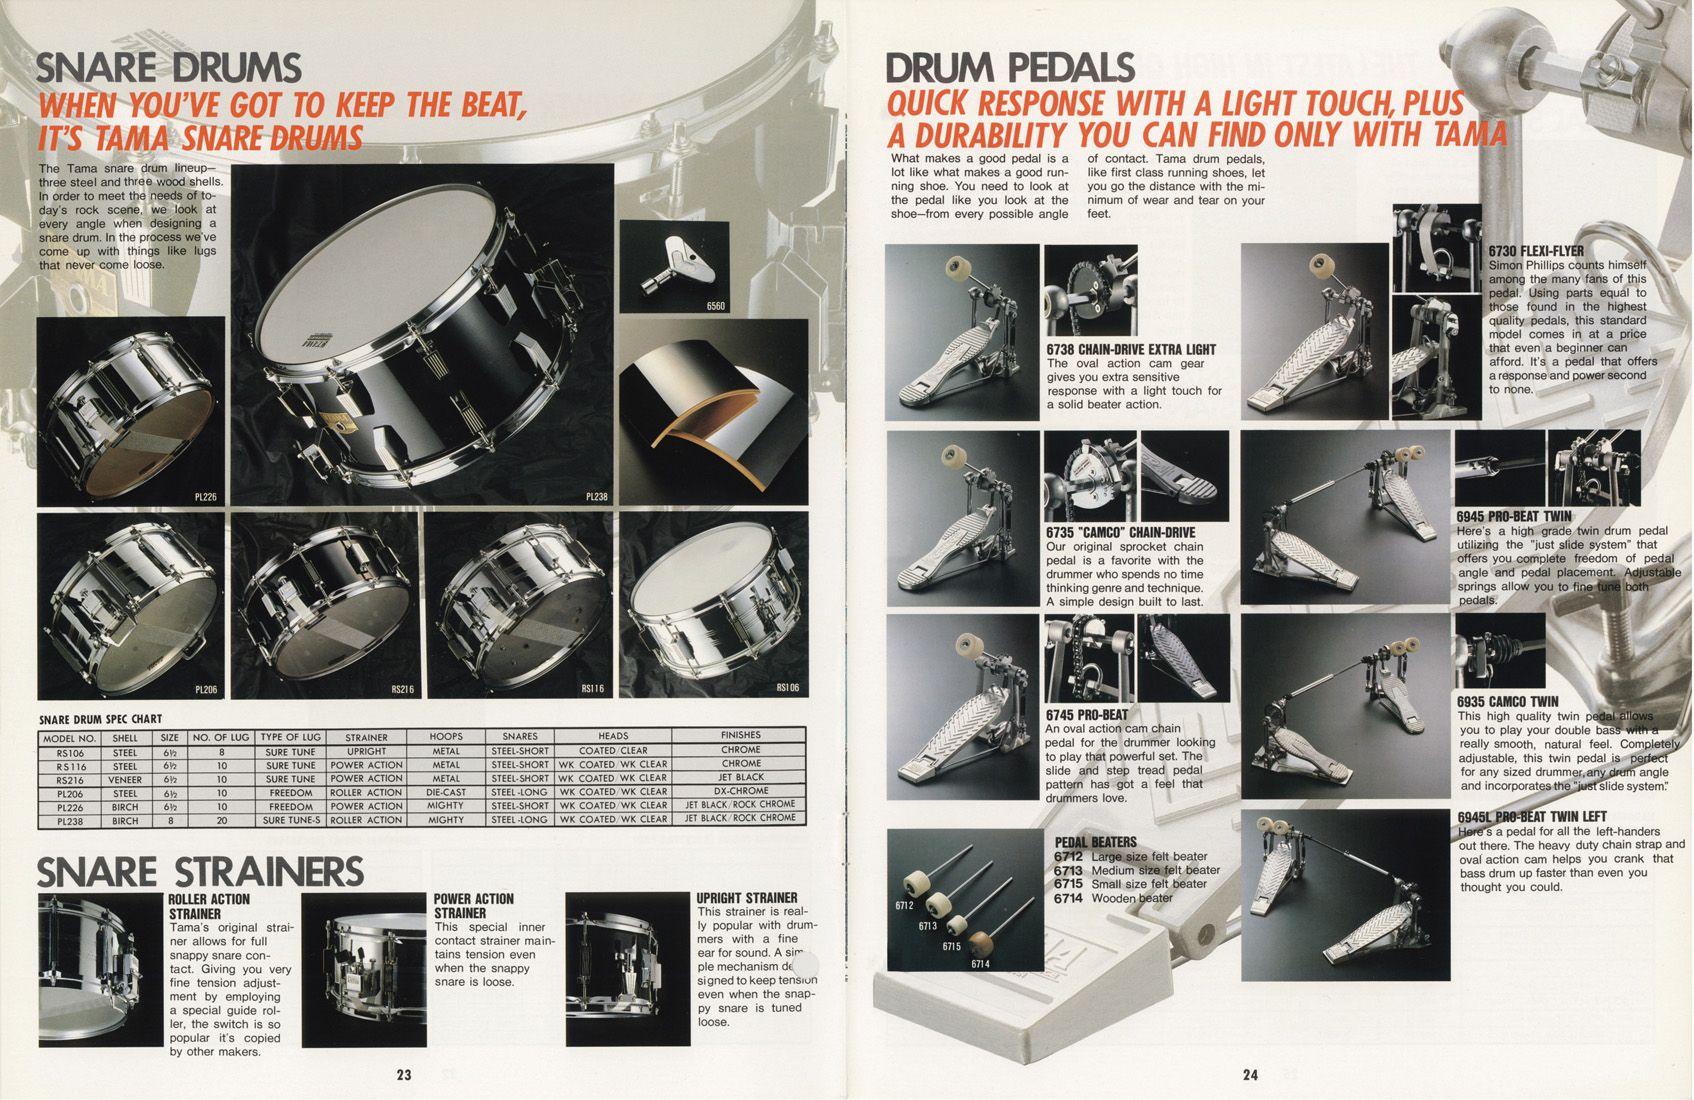 Catalogue 1988 Drum Pedals Drums Snare Drum